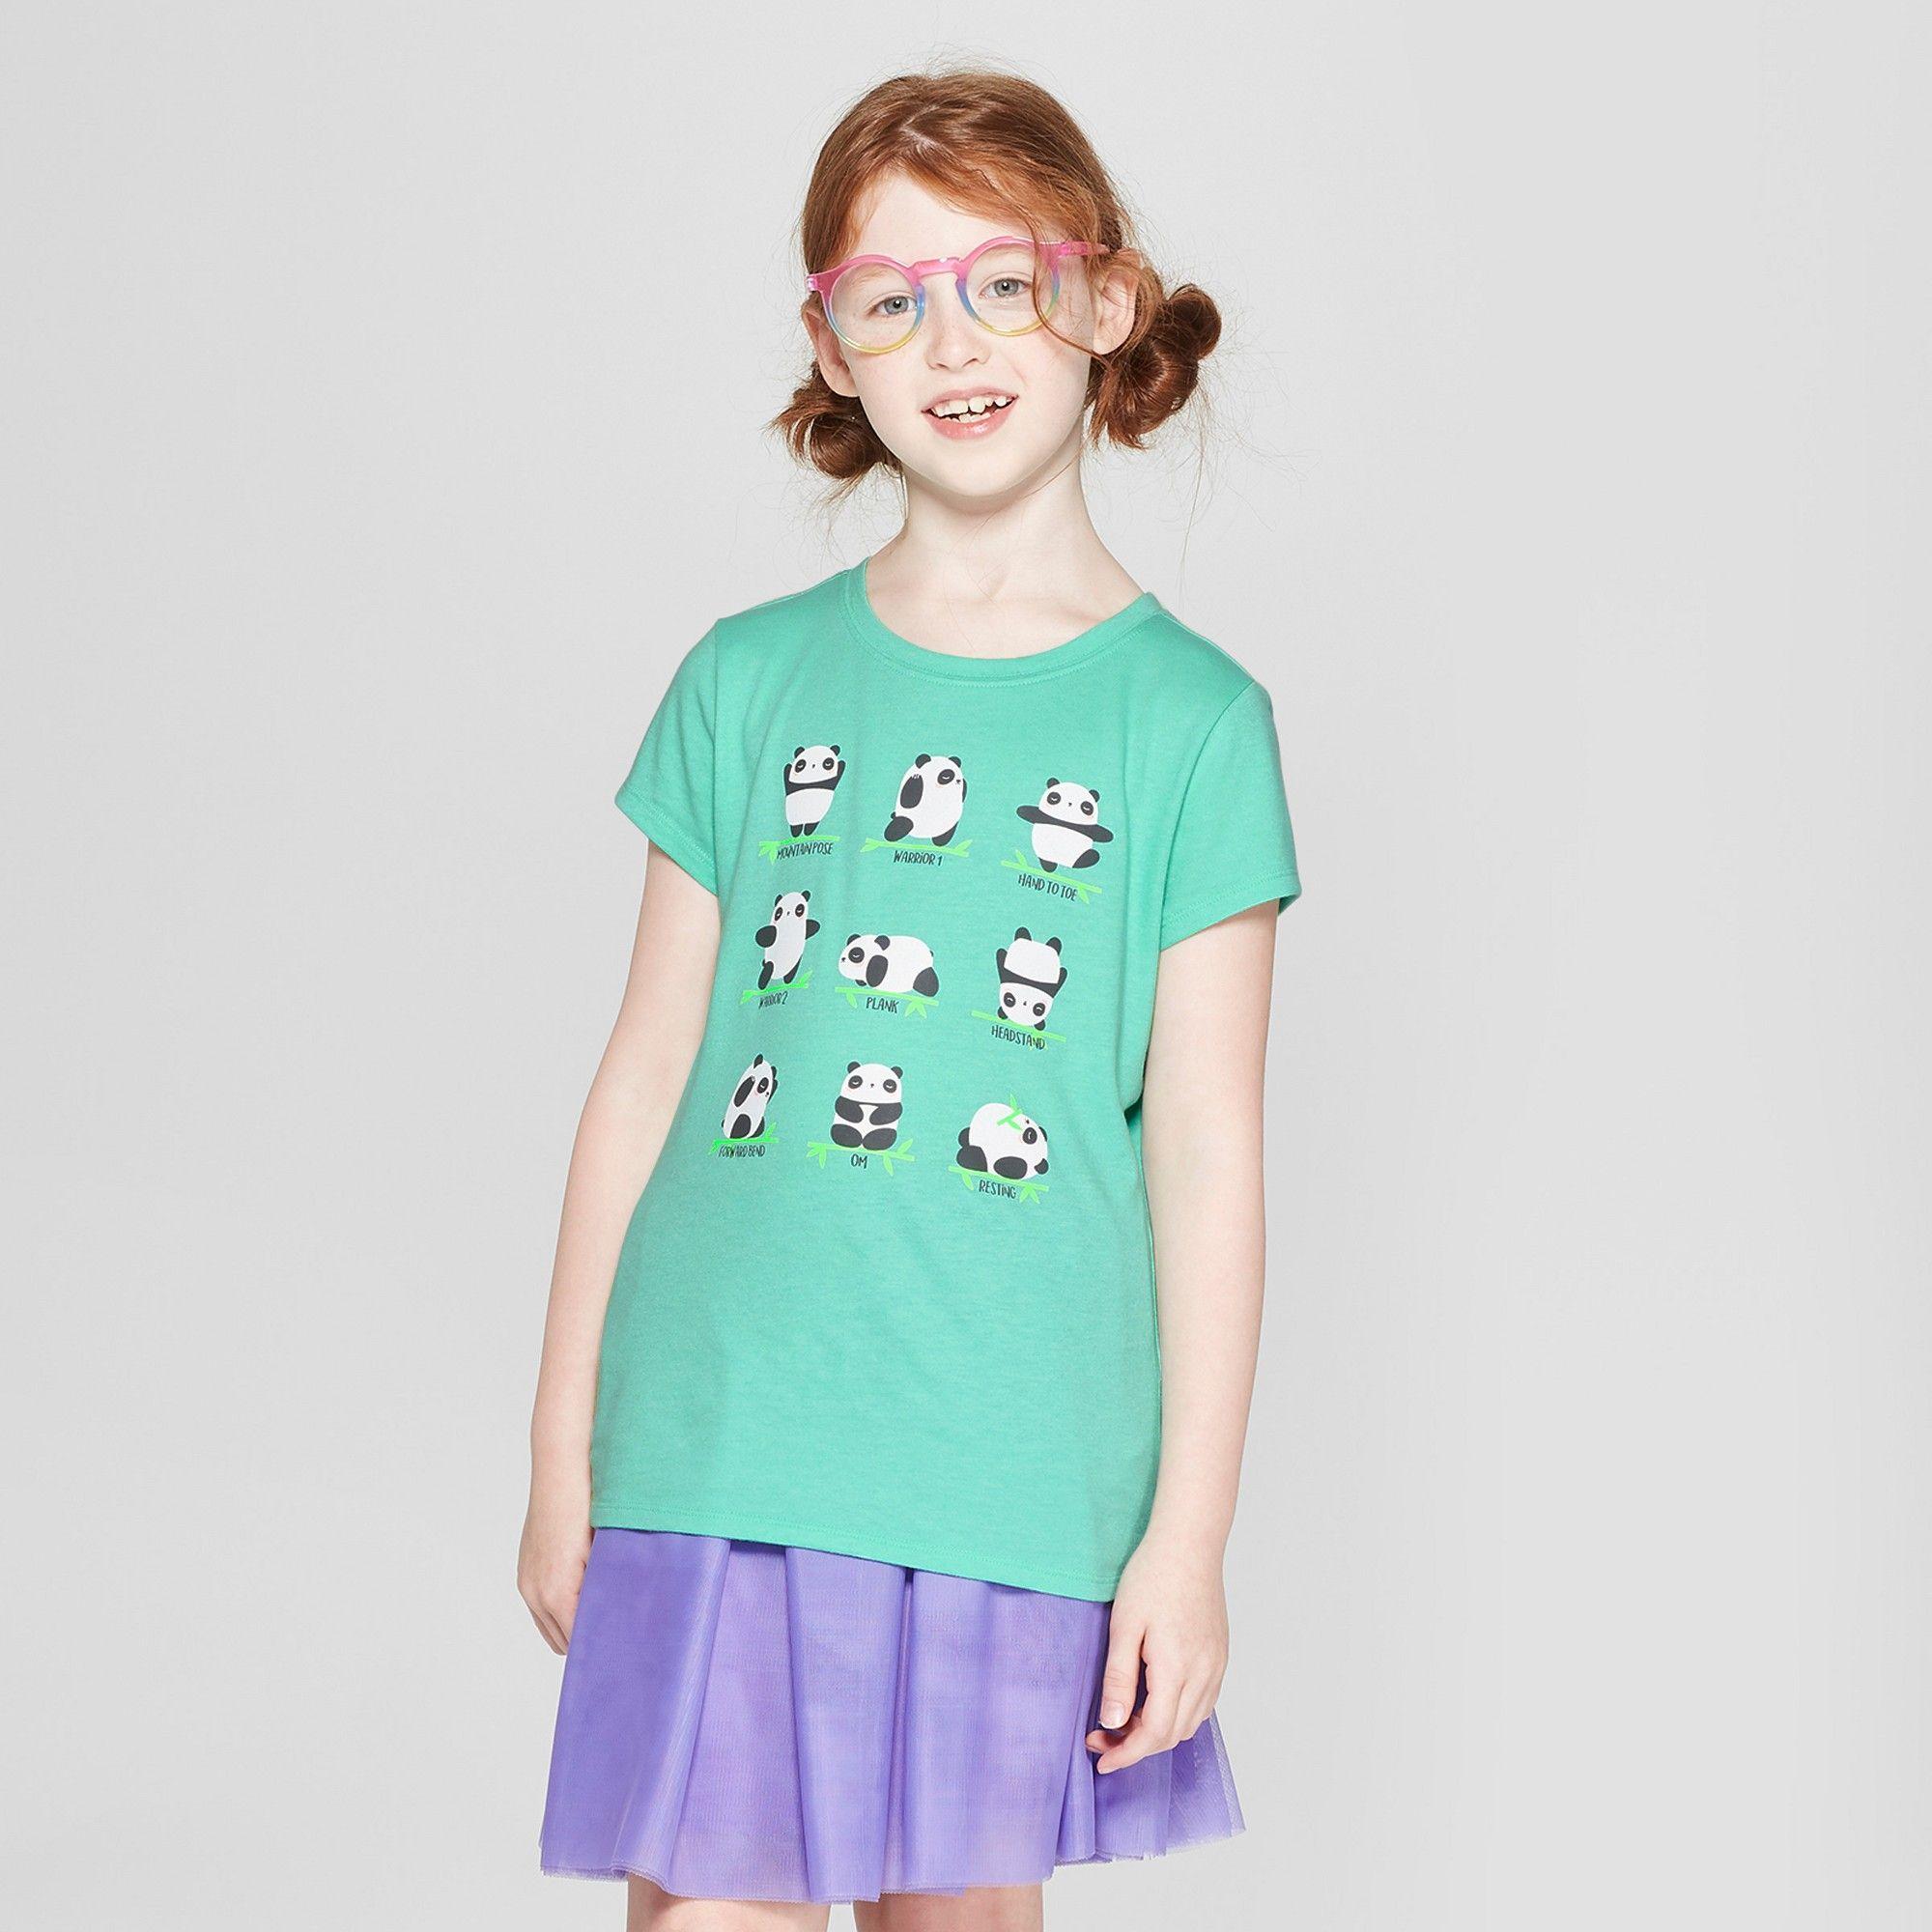 2442849c060 Girls' Short Sleeve Yoga Pandas Graphic T-Shirt - Cat & Jack Green ...